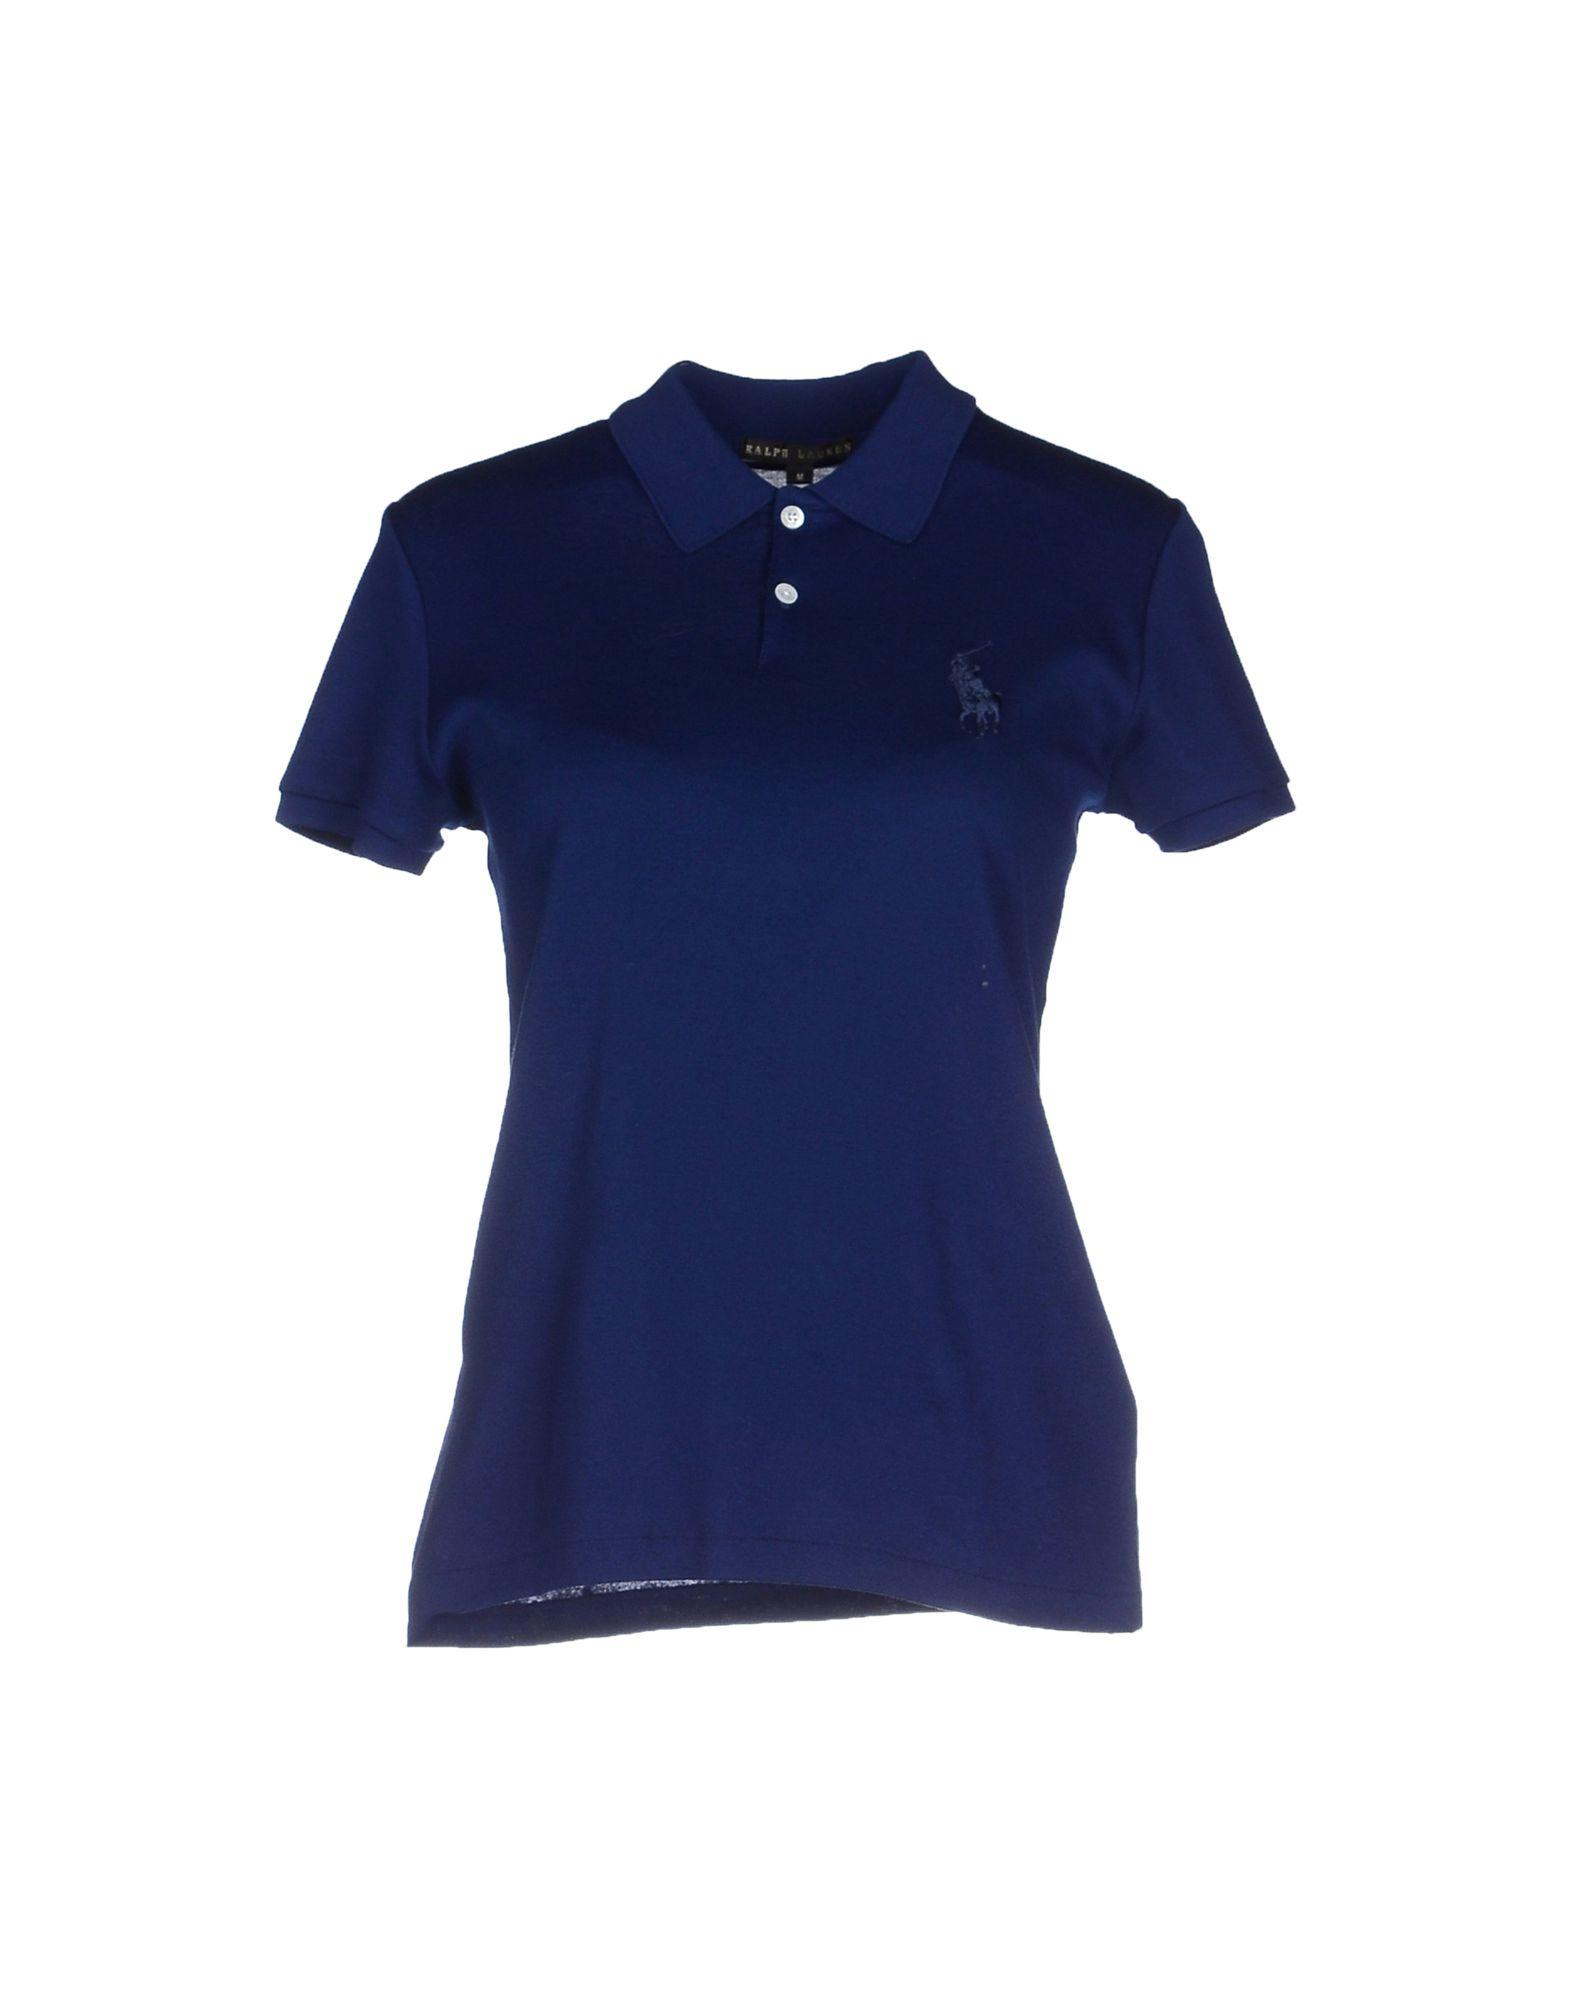 Ralph lauren black label polo shirt in blue dark blue lyst for Ralph lauren black label polo shirt